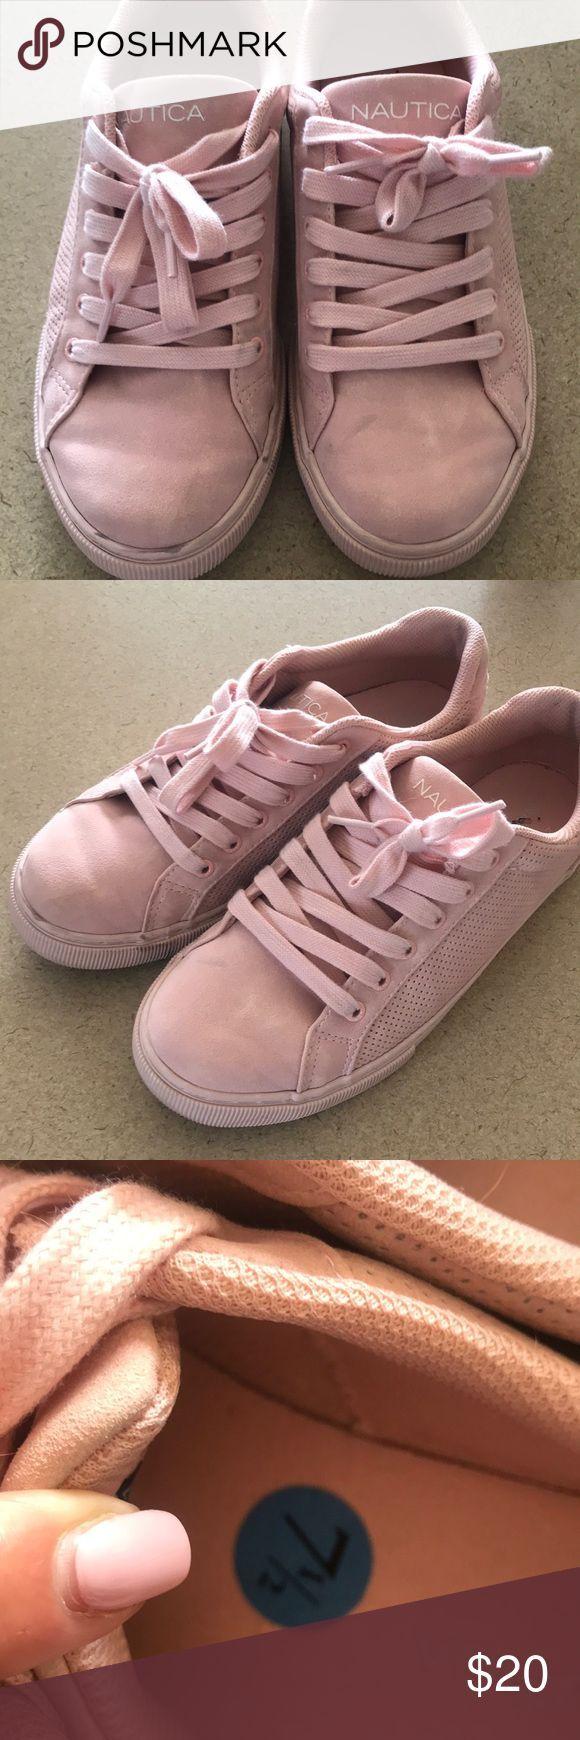 Nautica Shoes blush pink, great